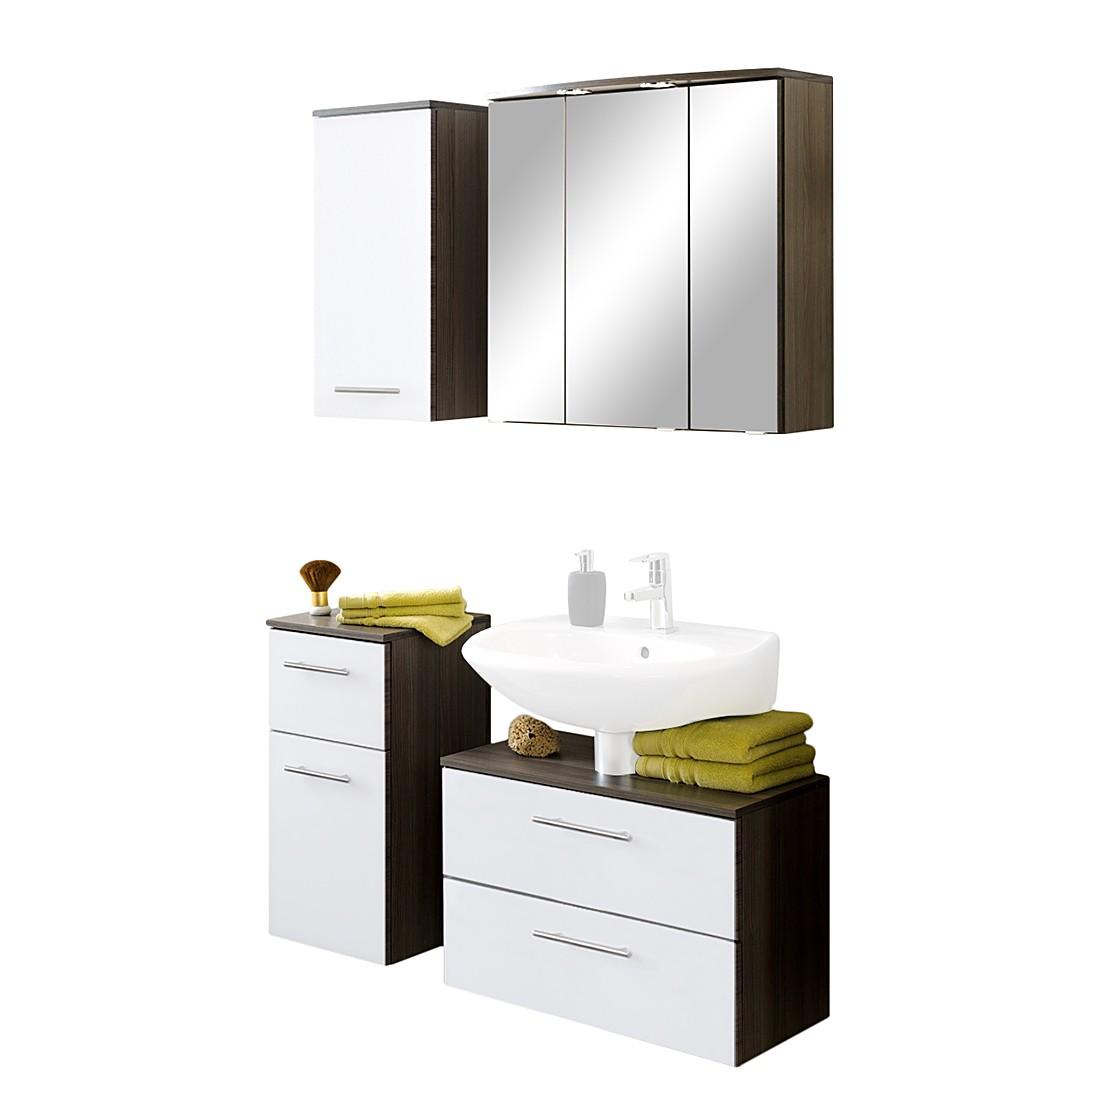 Home 24 - Ensemble de meubles, 4 éléments well-ness - chêne foncé / blanc, giessbach